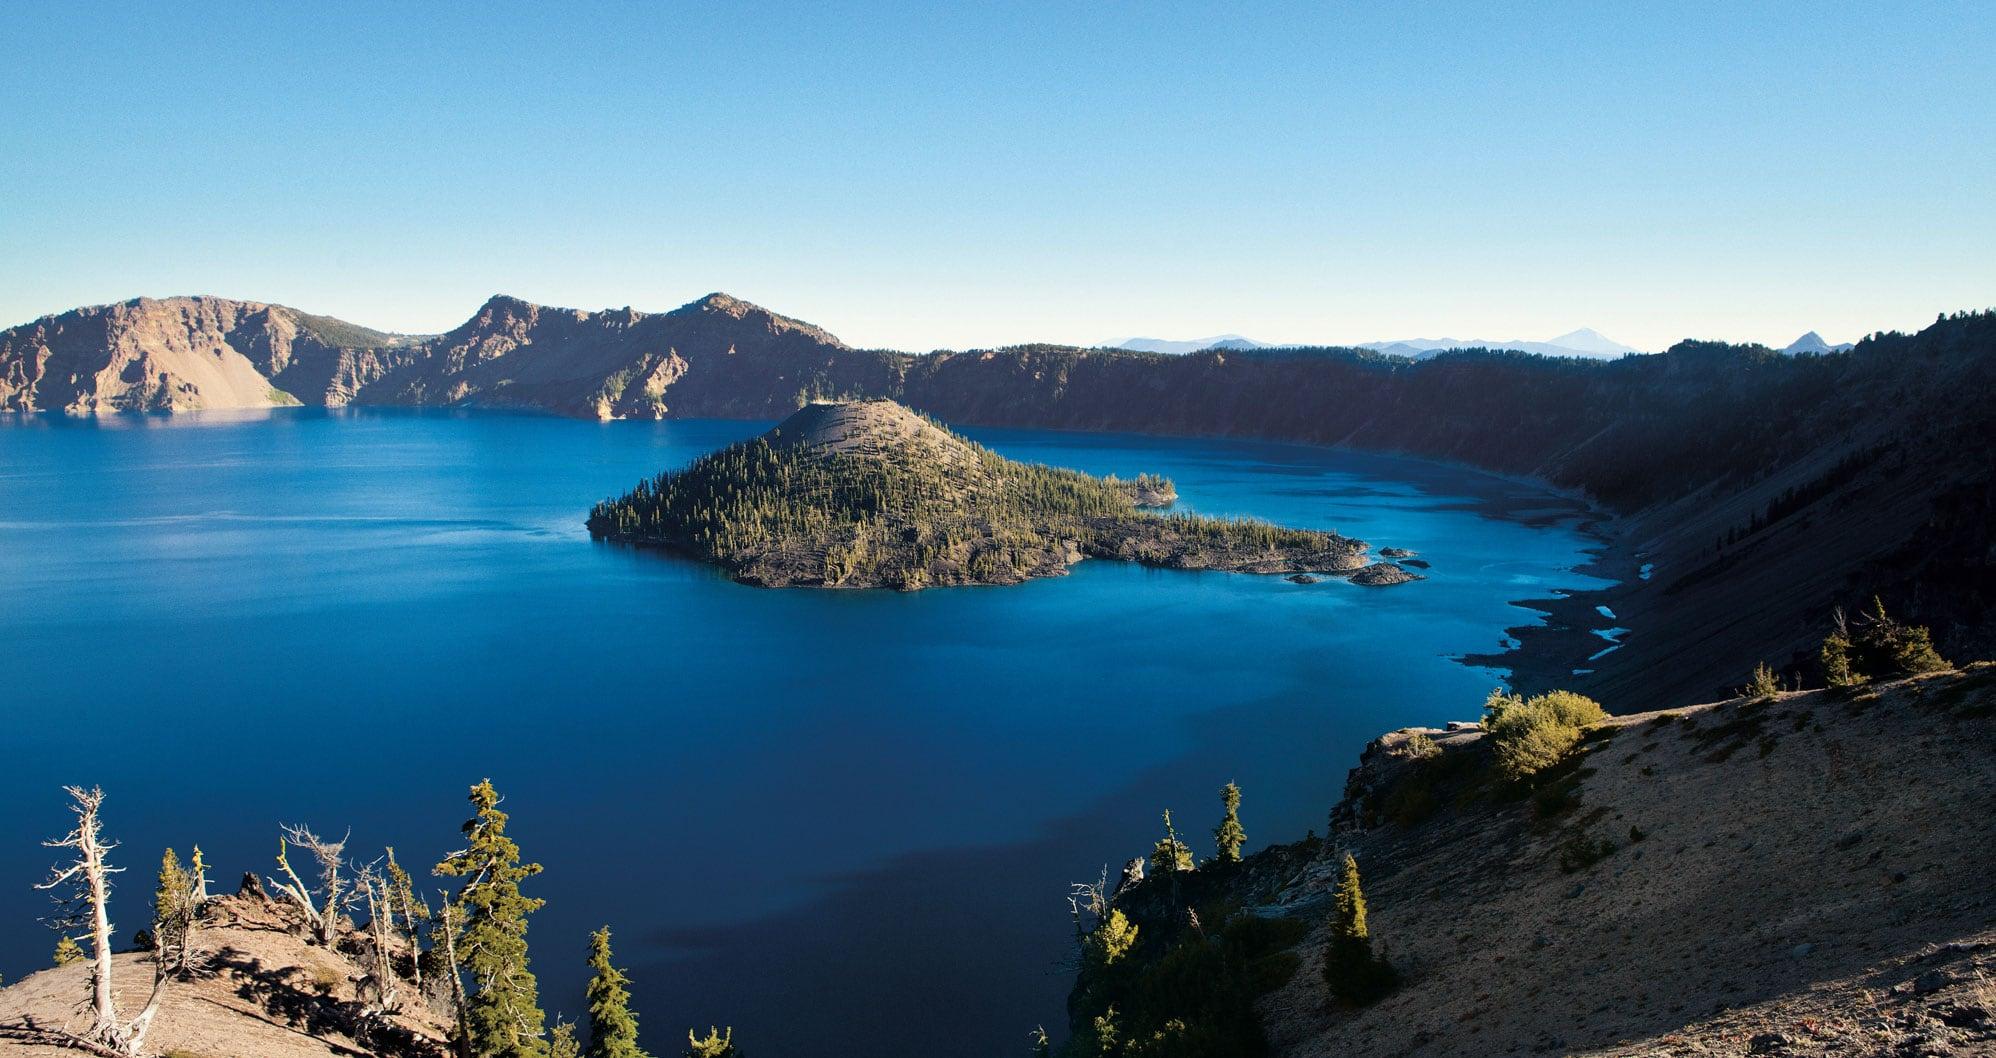 7 Wonders of Oregon Crater Lake Americas Deepest Lake